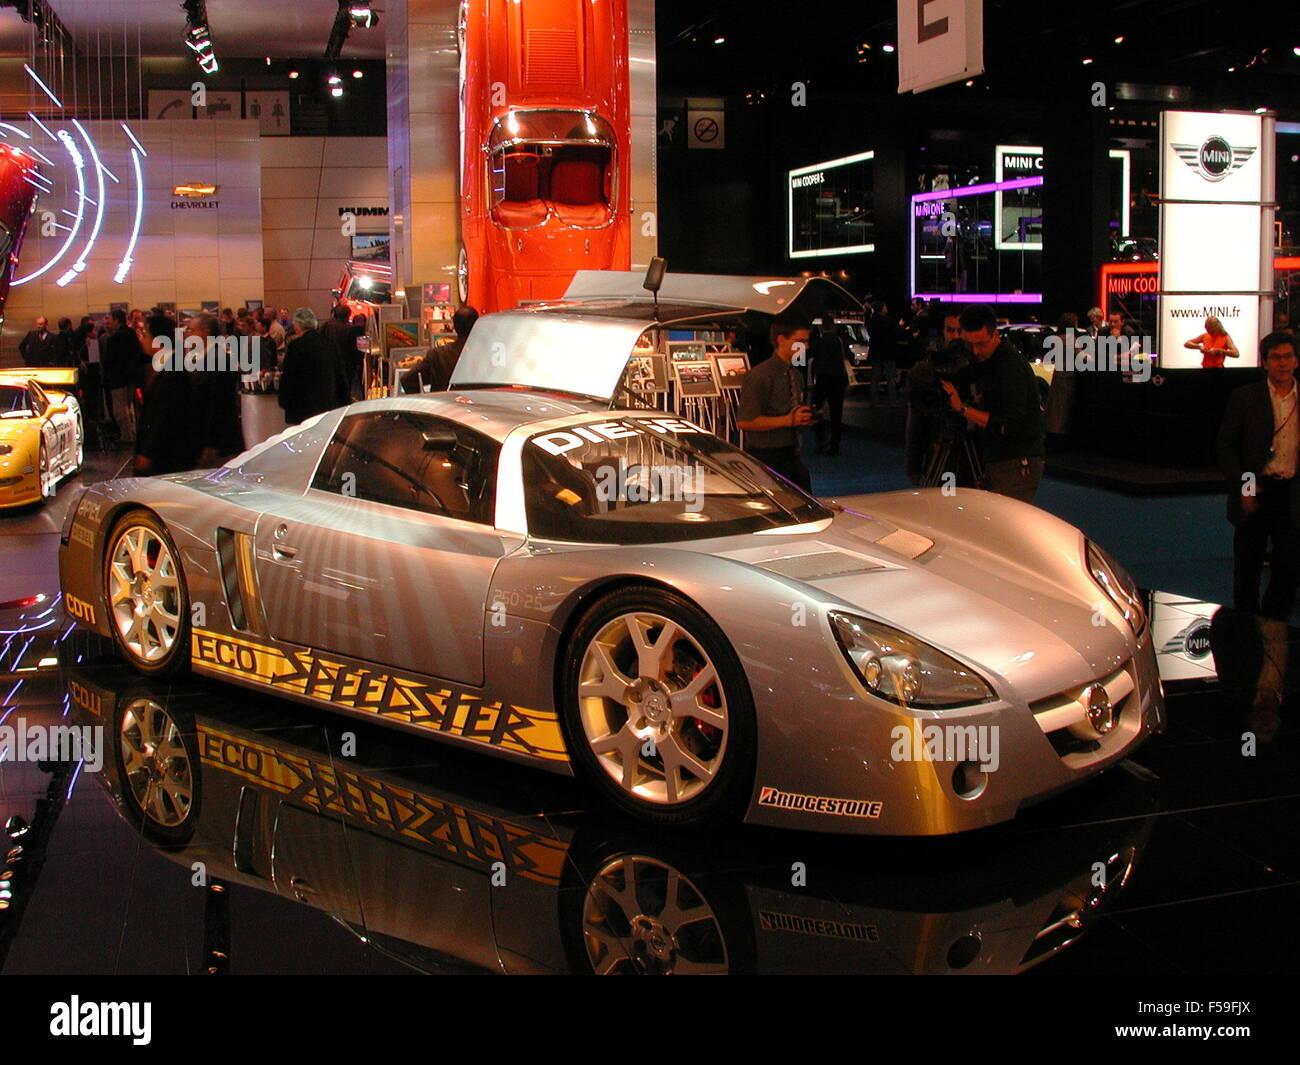 Vauxhall Concept Car Stock Photos Vx Lightning Opel Eco Speedster As Shown At 2002 Paris Motorshow Image